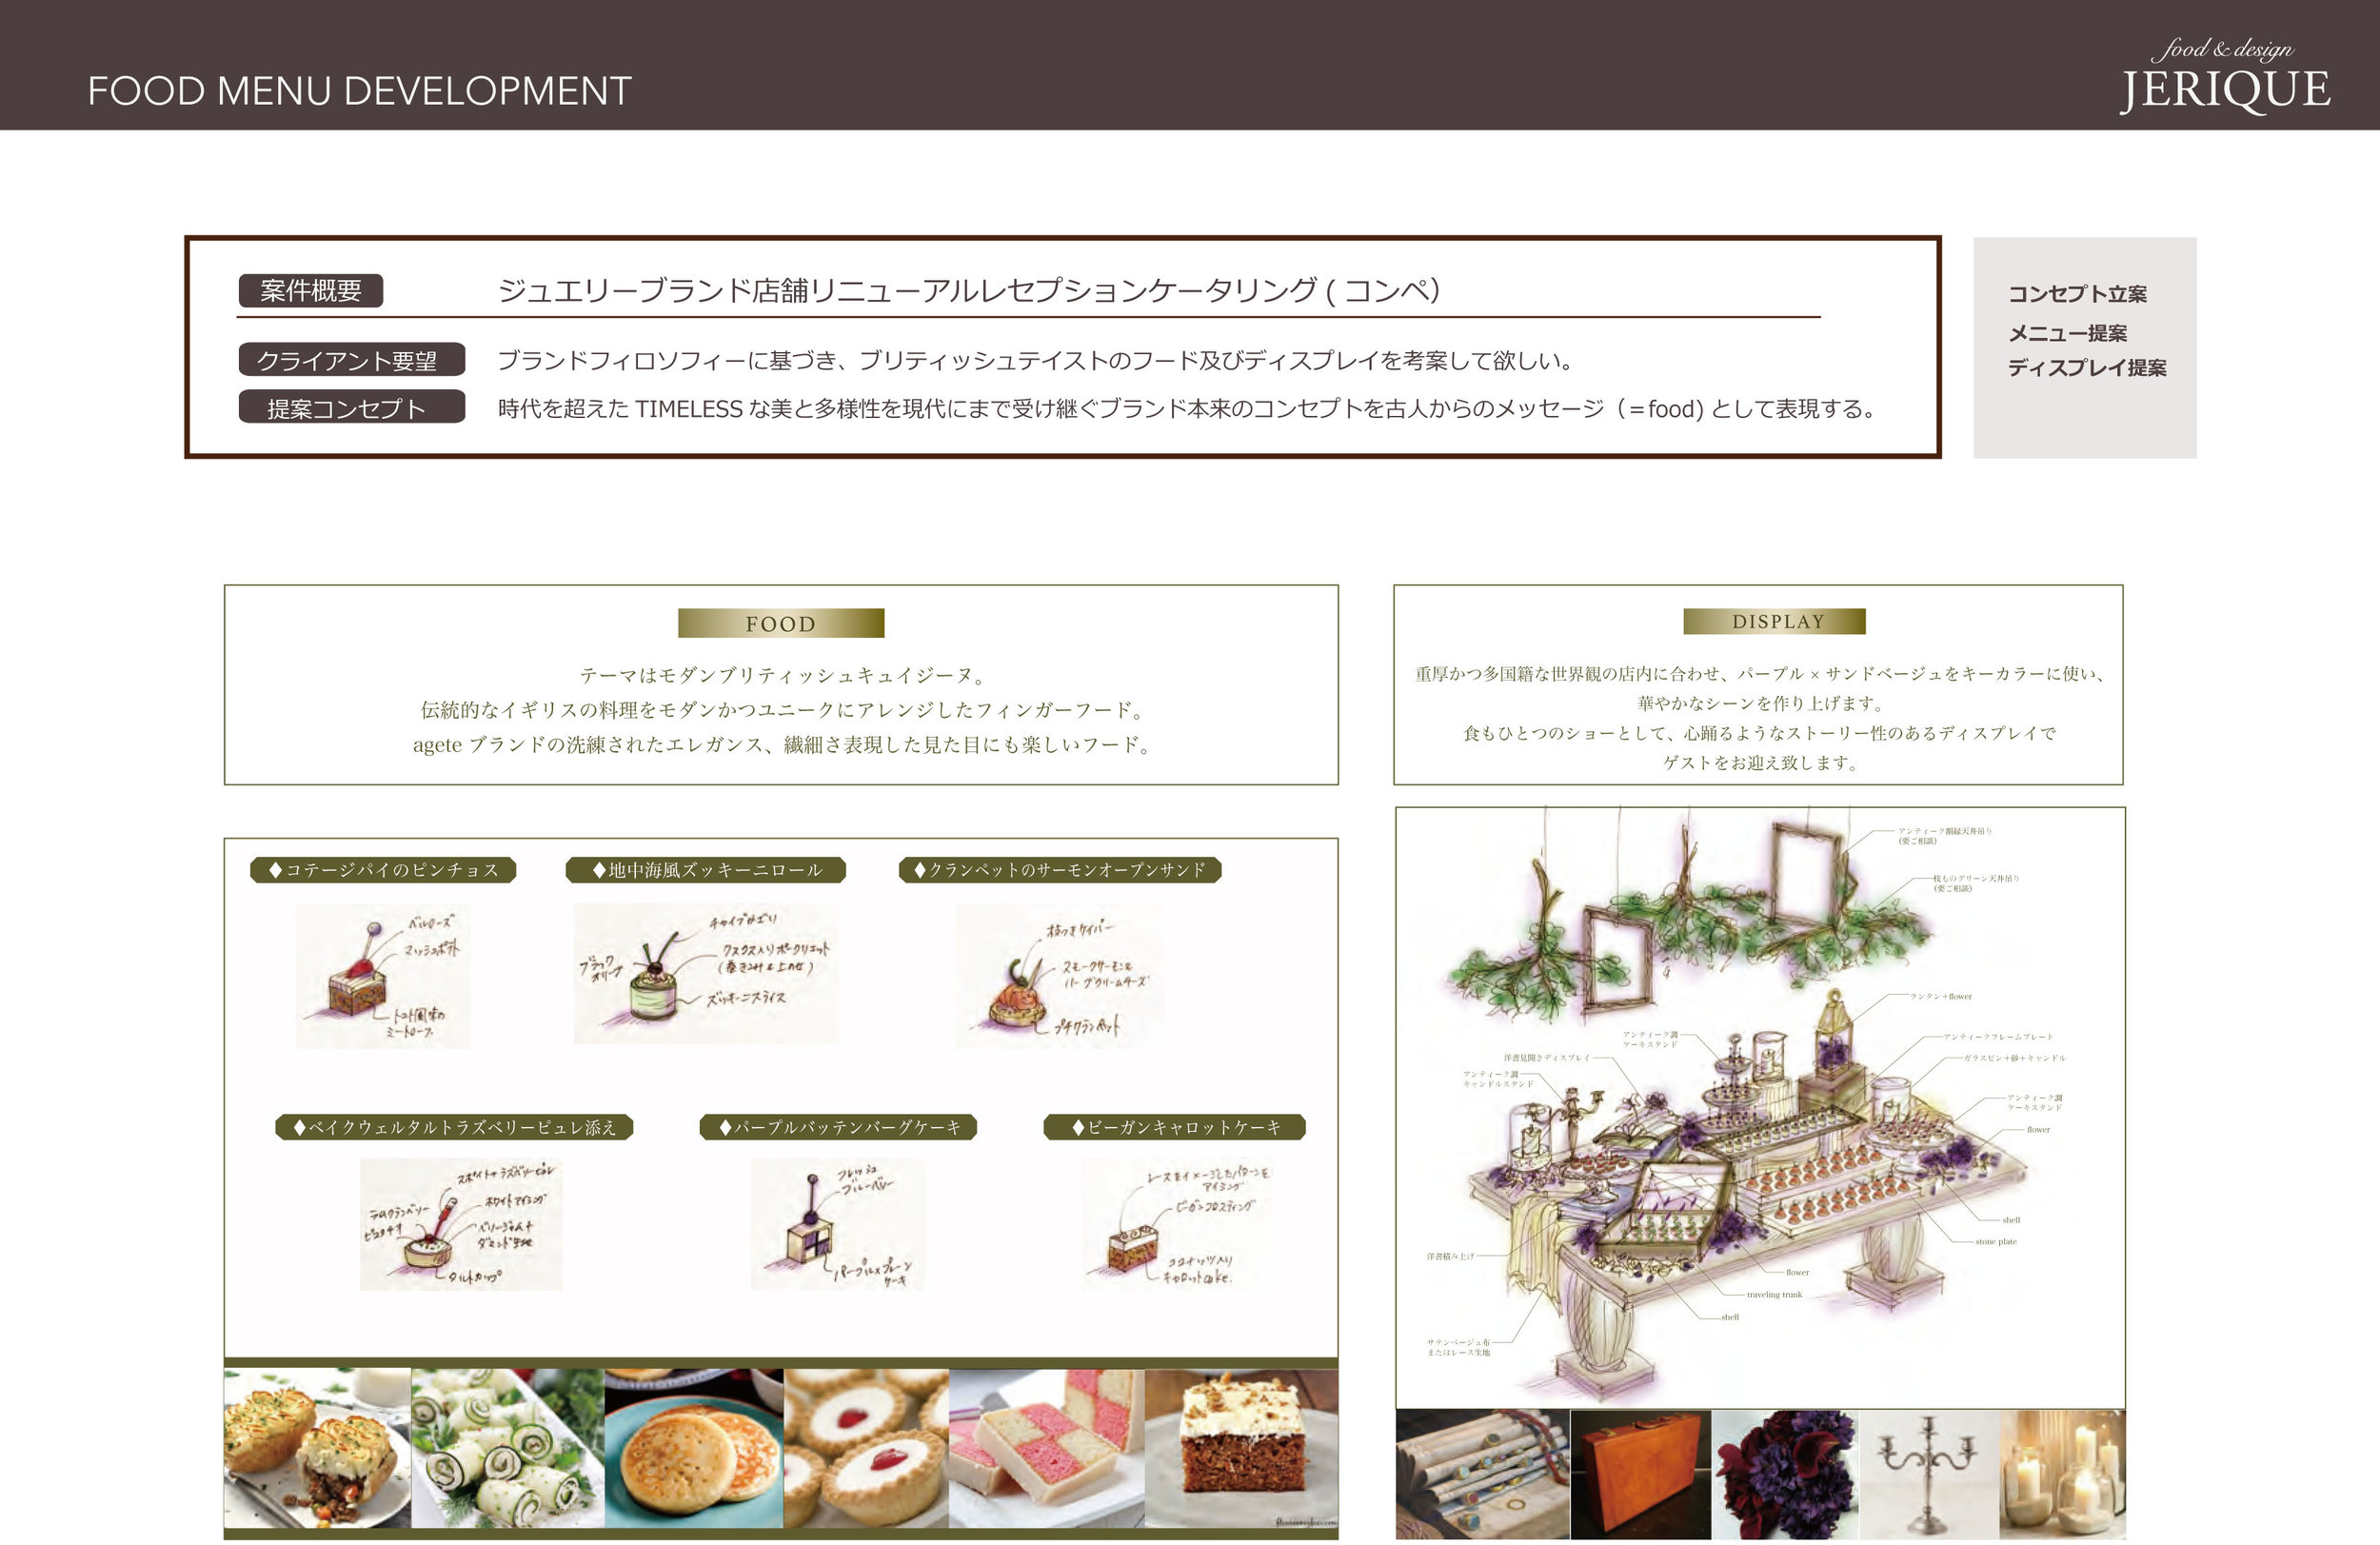 JERIQUE_FOOD DEVELOPMENT-10.jpg